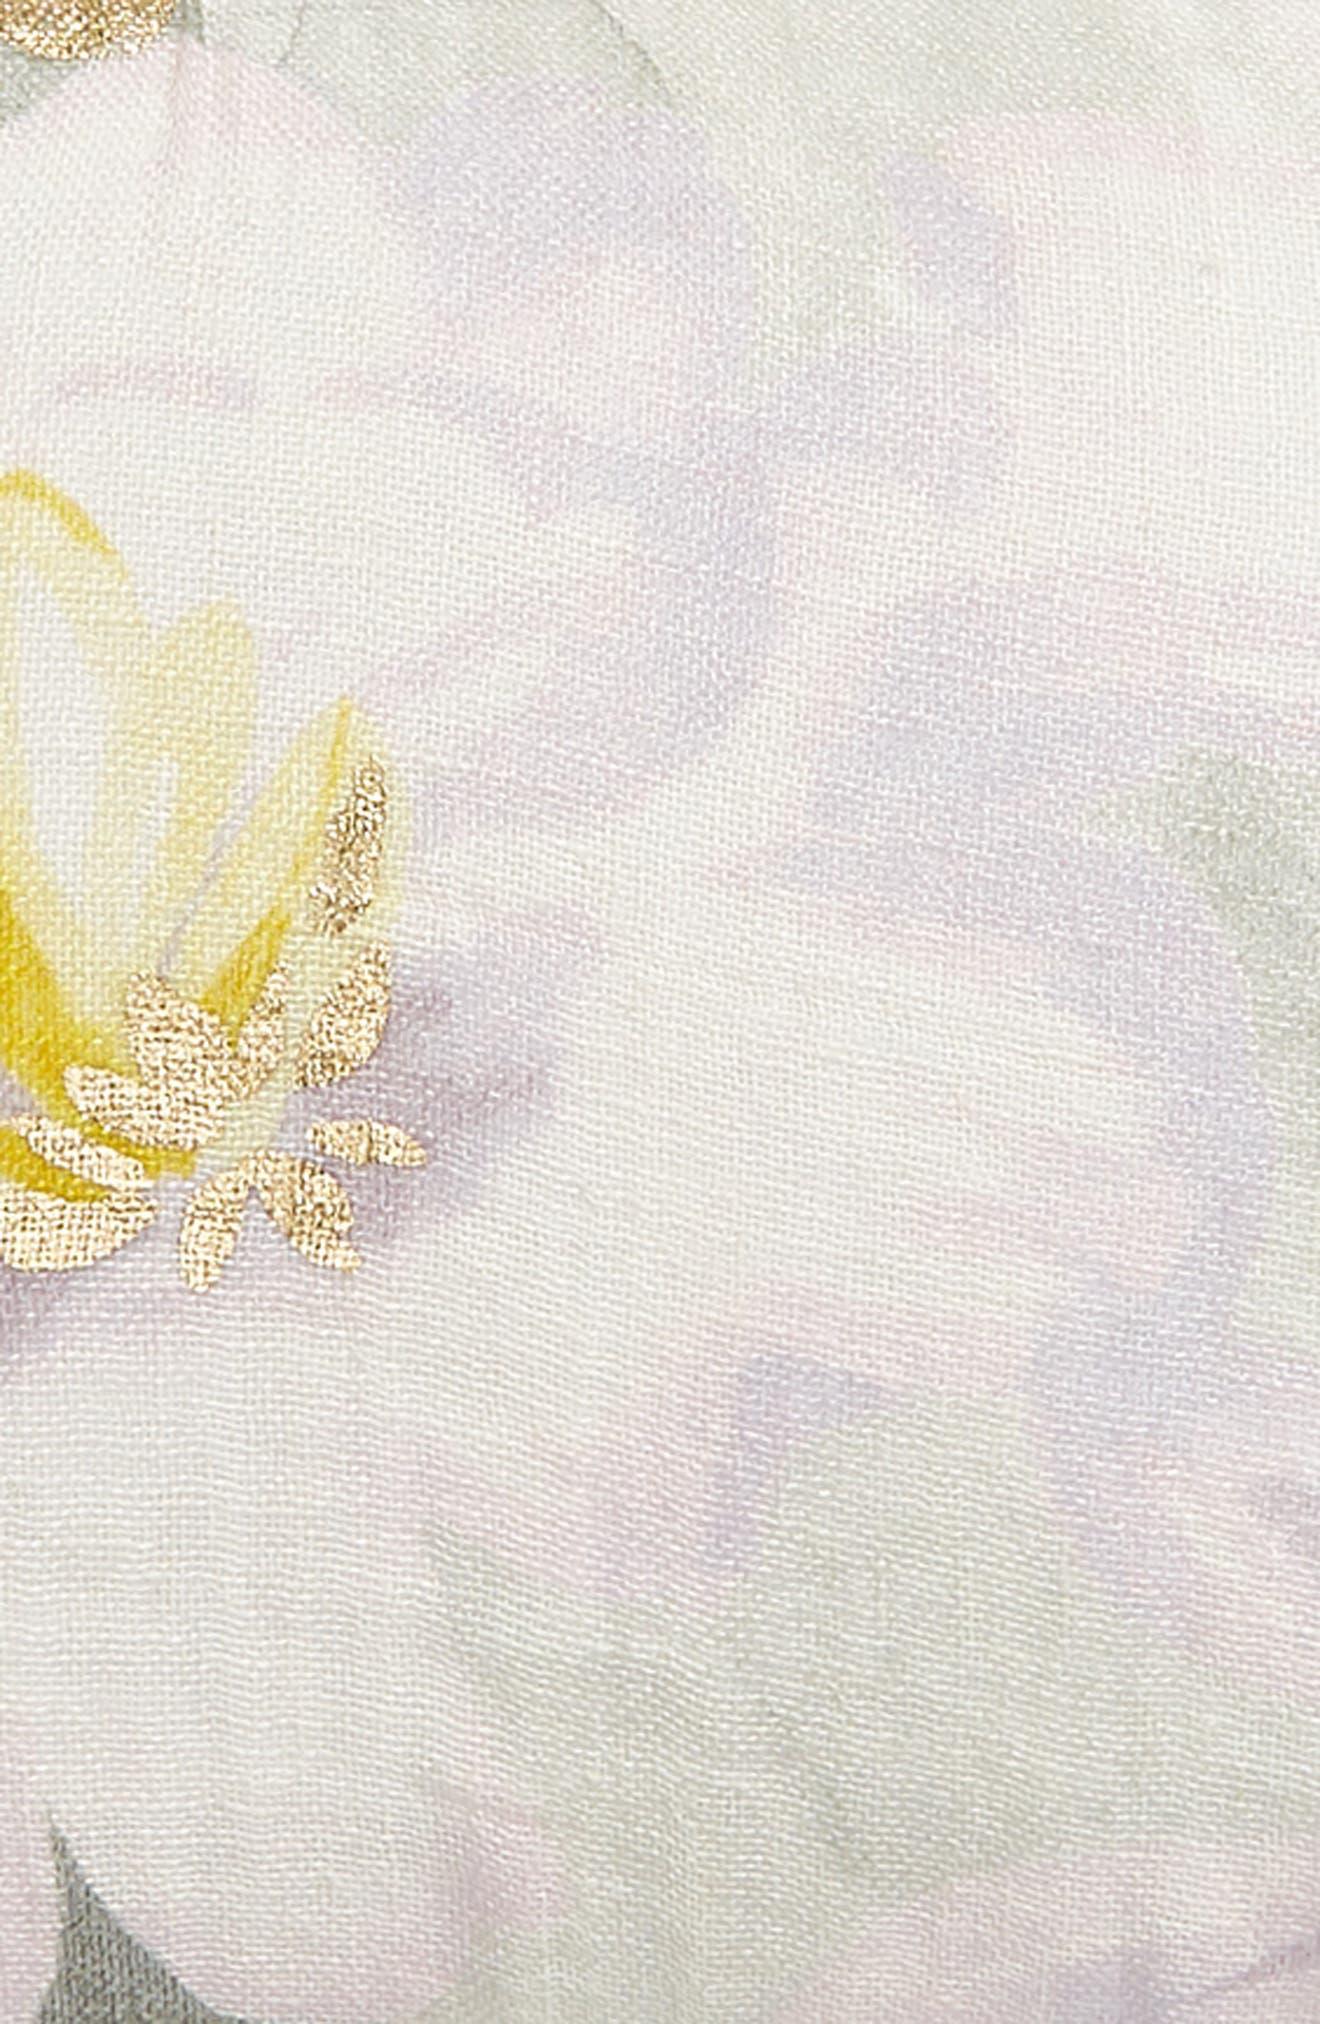 NORDSTROM AT HOME, Floral Linen Accent Pillow, Alternate thumbnail 3, color, GREY VAPOR MULTI